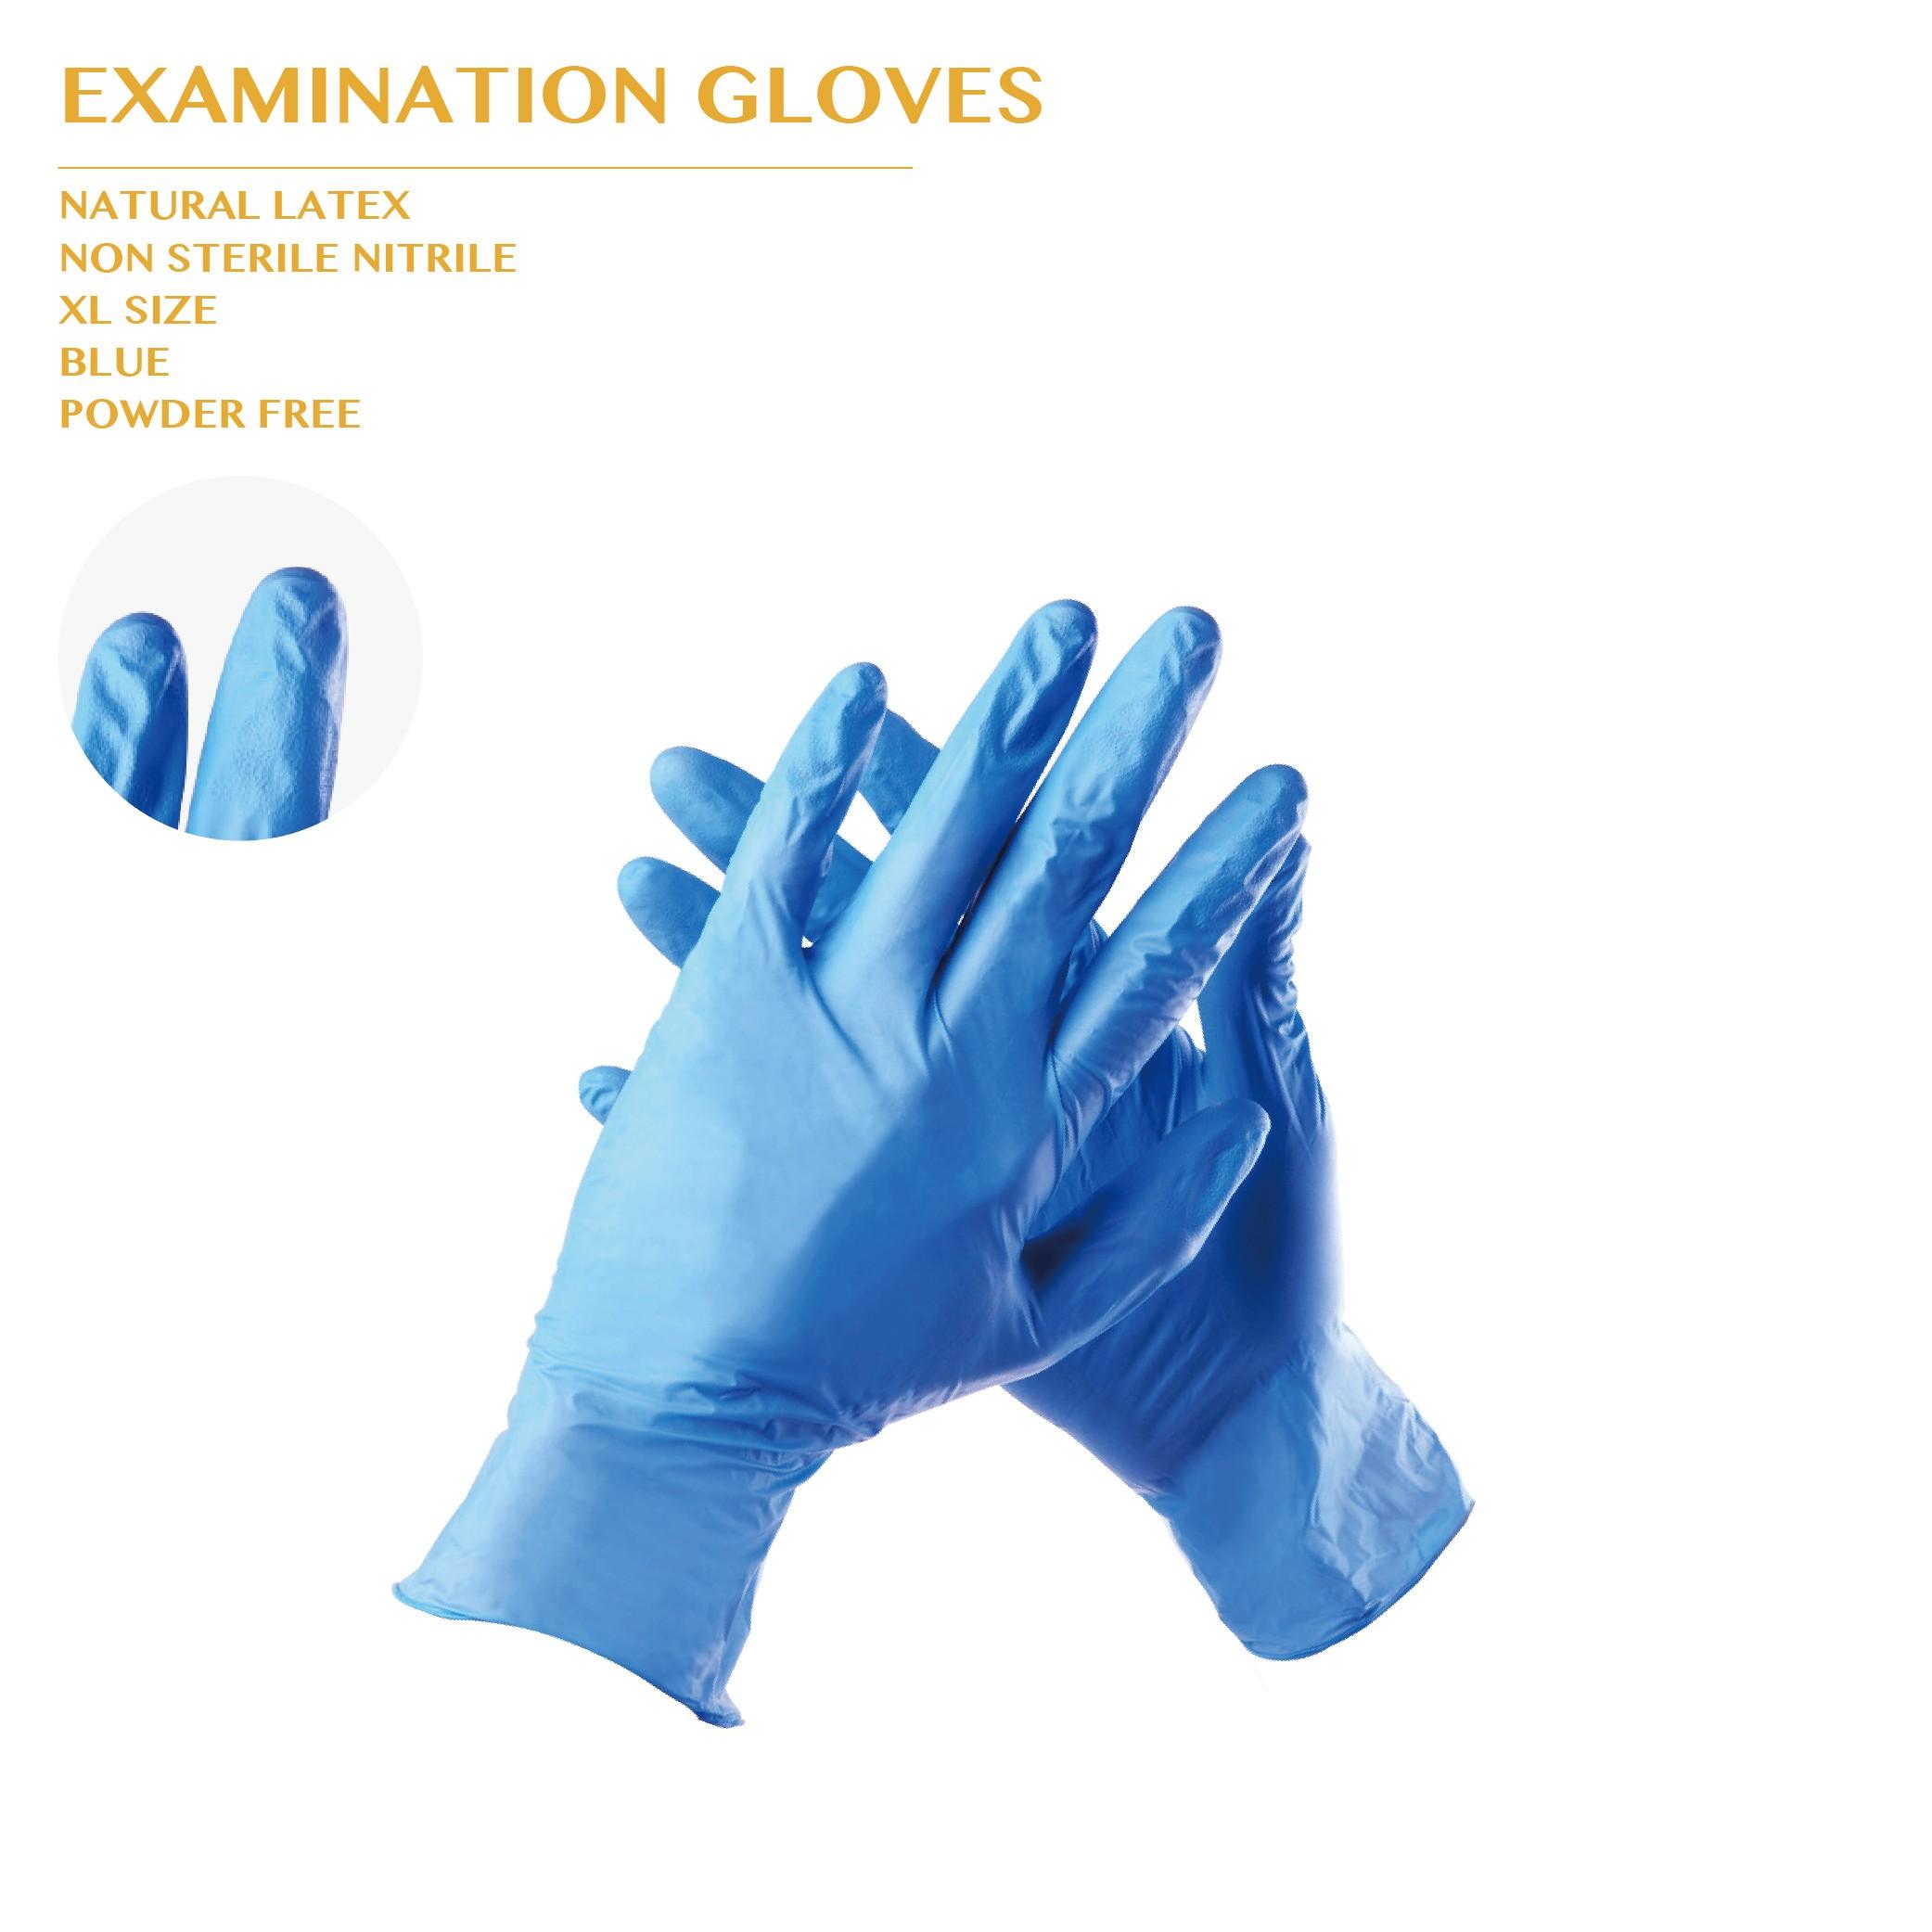 PRO-ORDER EXAMINATION GLOVES XL SIZE 10BOX/CTN